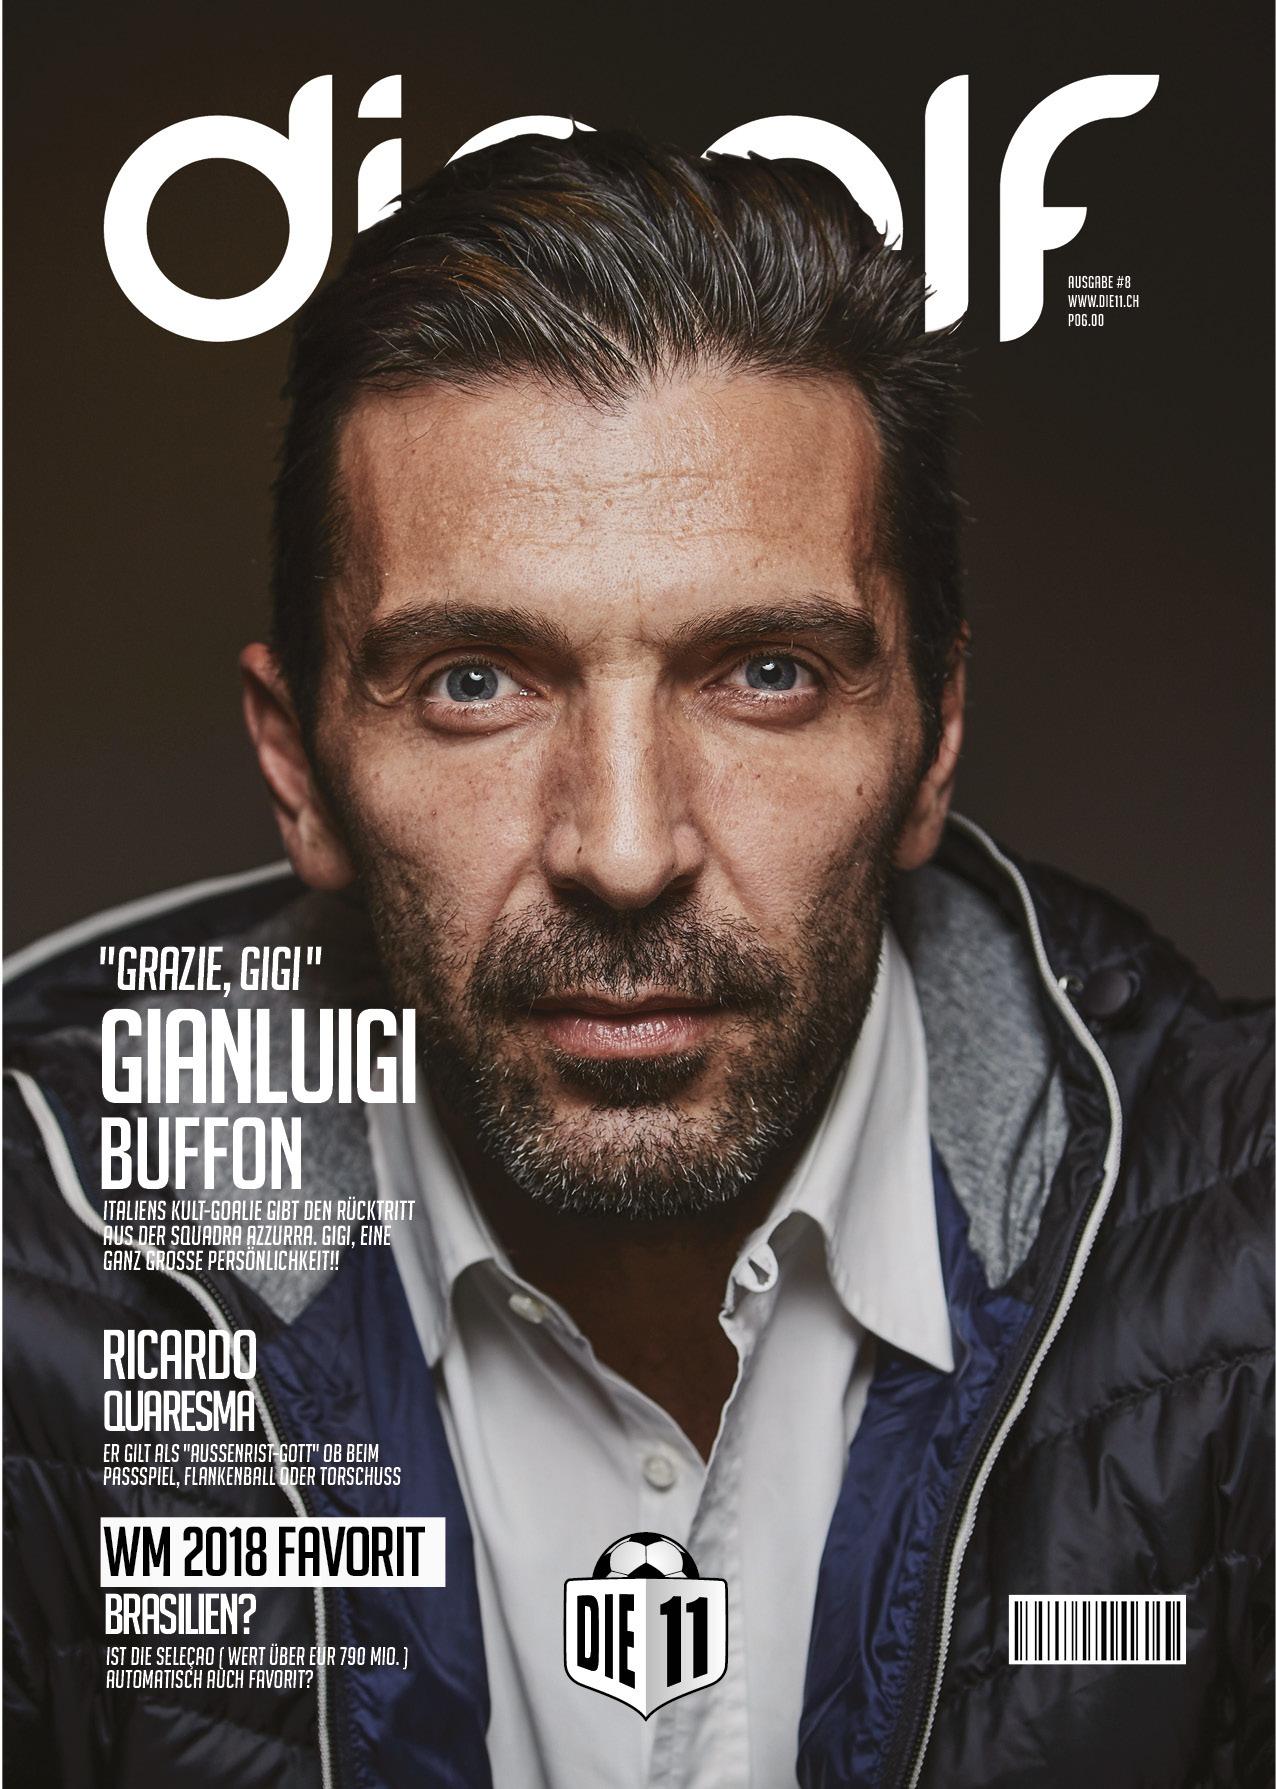 Gianluigi Buffon Die11 Cover